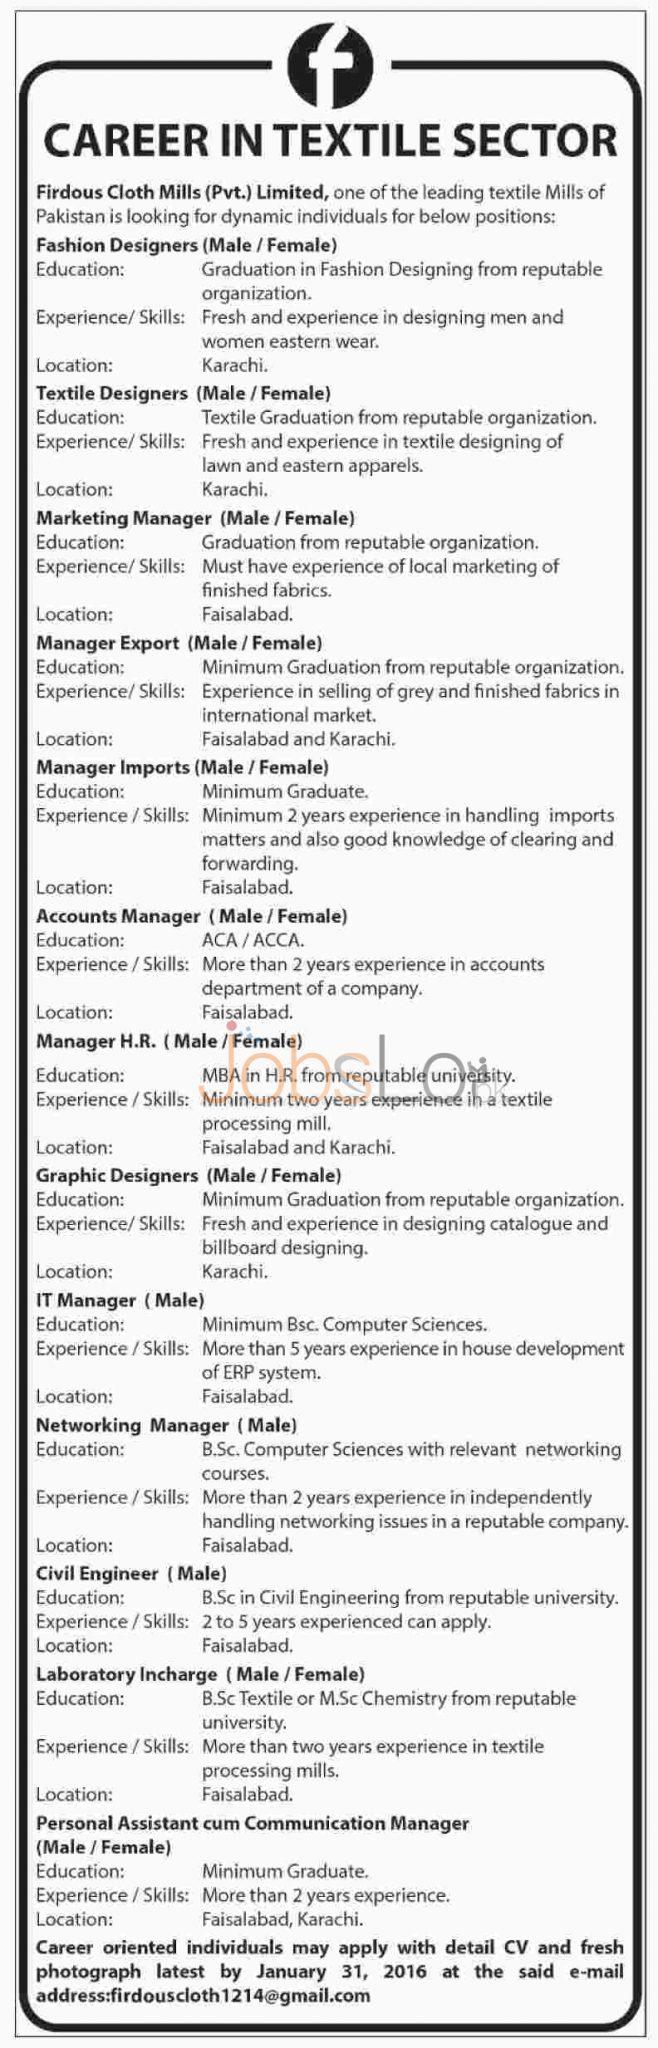 Vacancies in Karachi & Faisalabad Firdous Cloth Mills Private Ltd